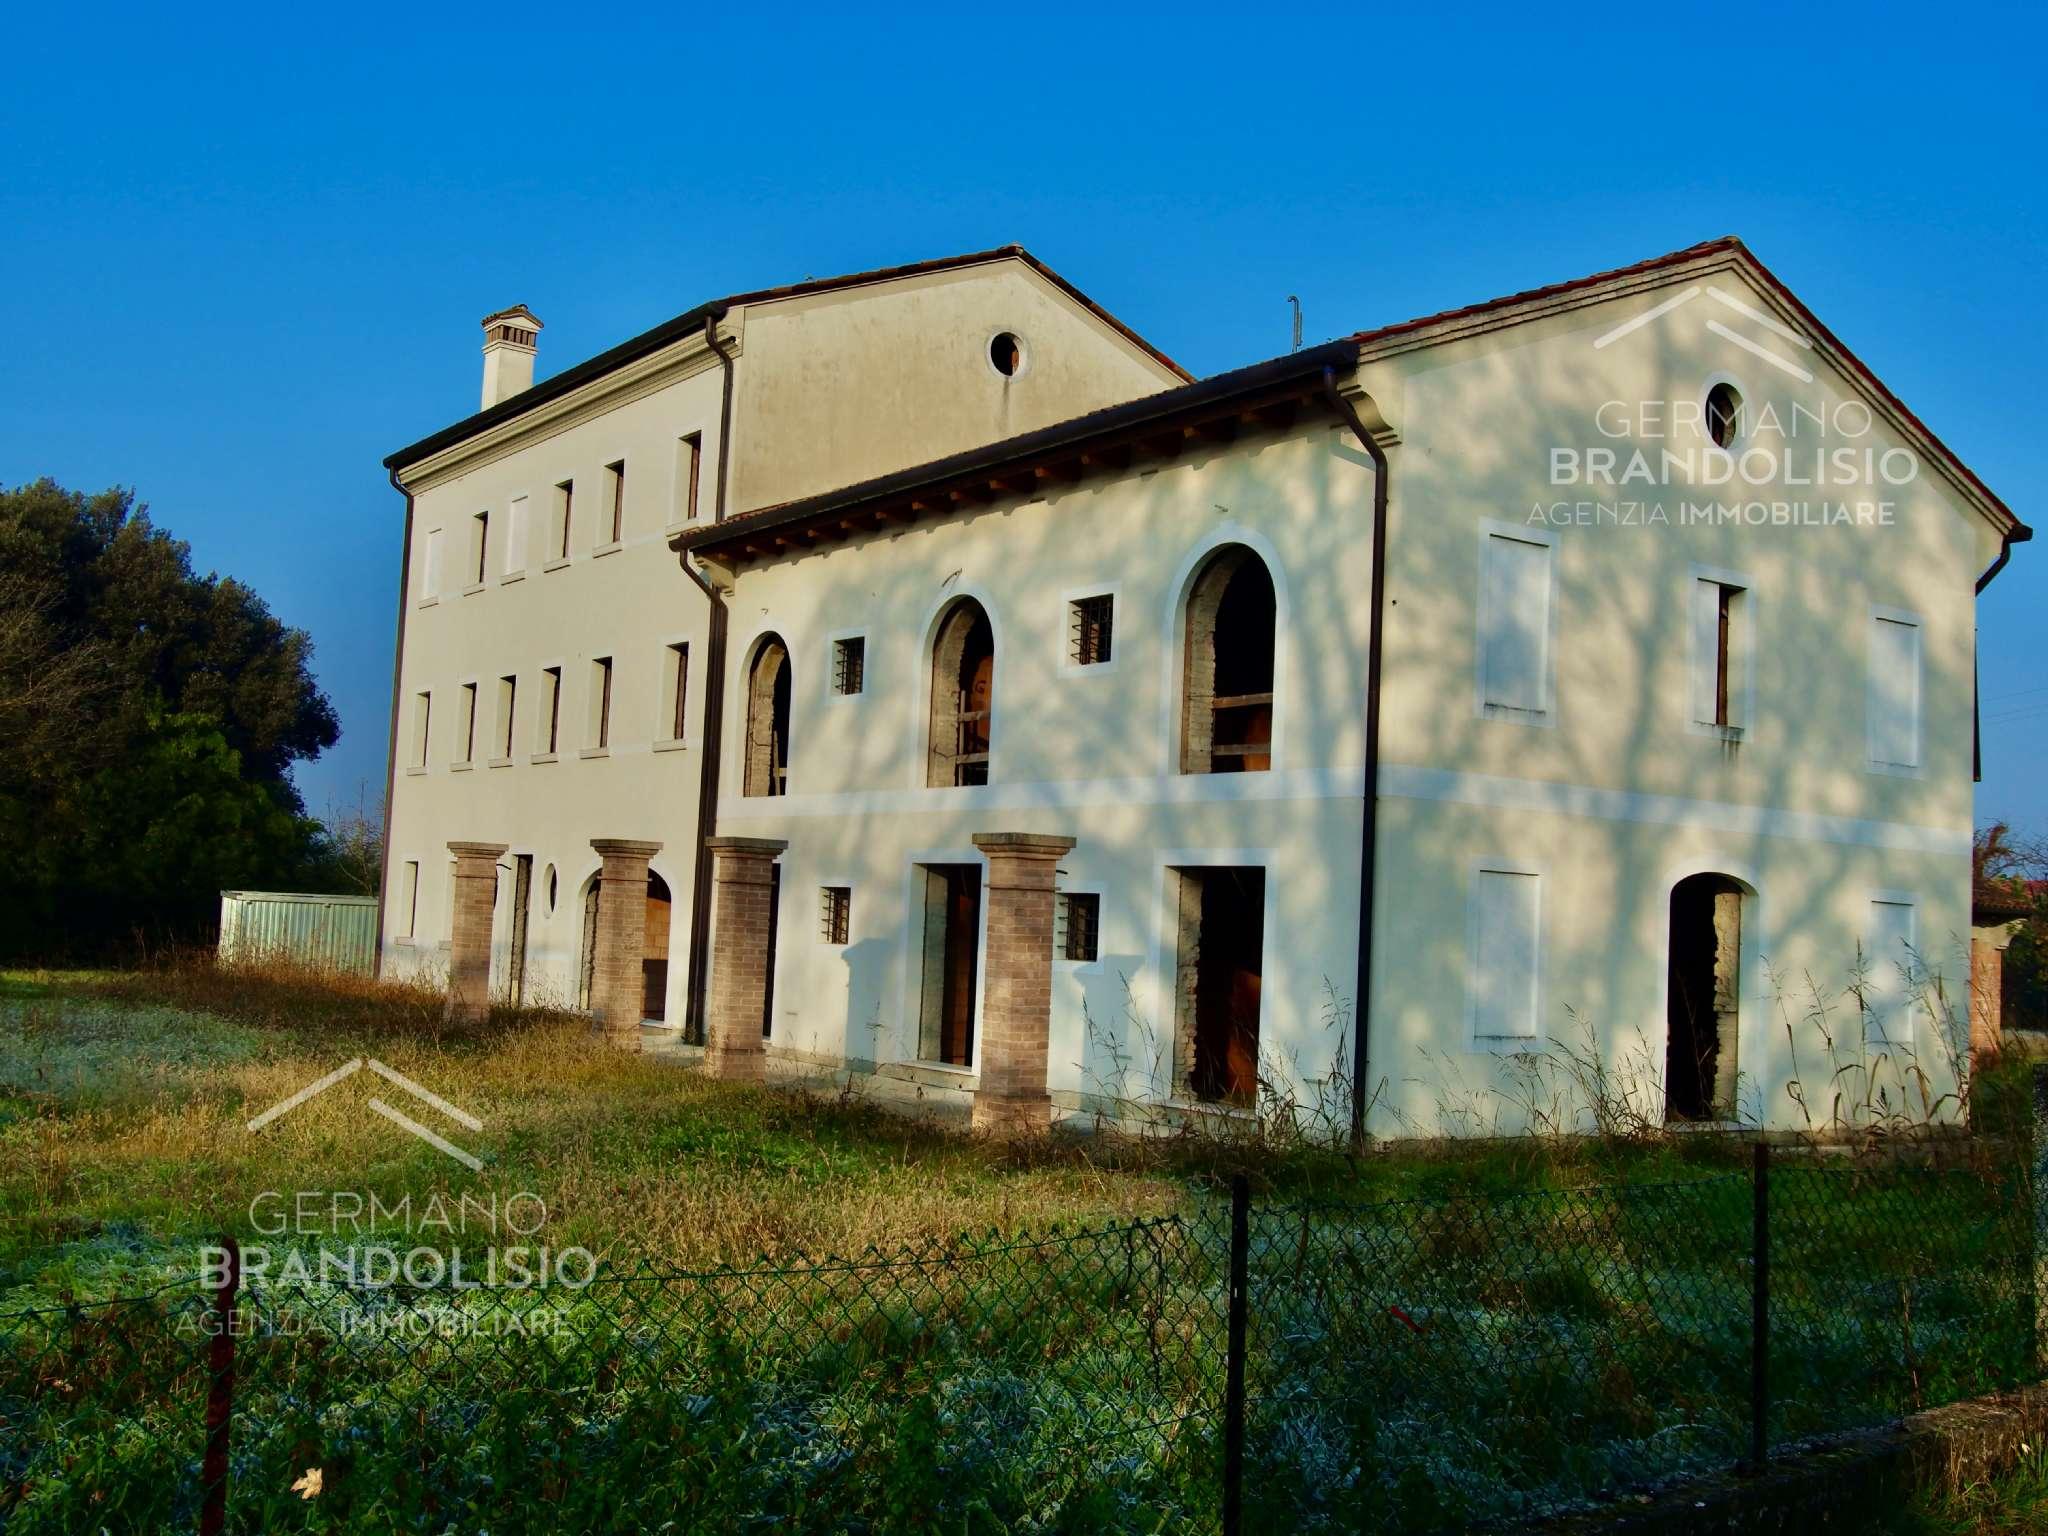 Soluzione Semindipendente in Vendita a San Biagio di Callalta